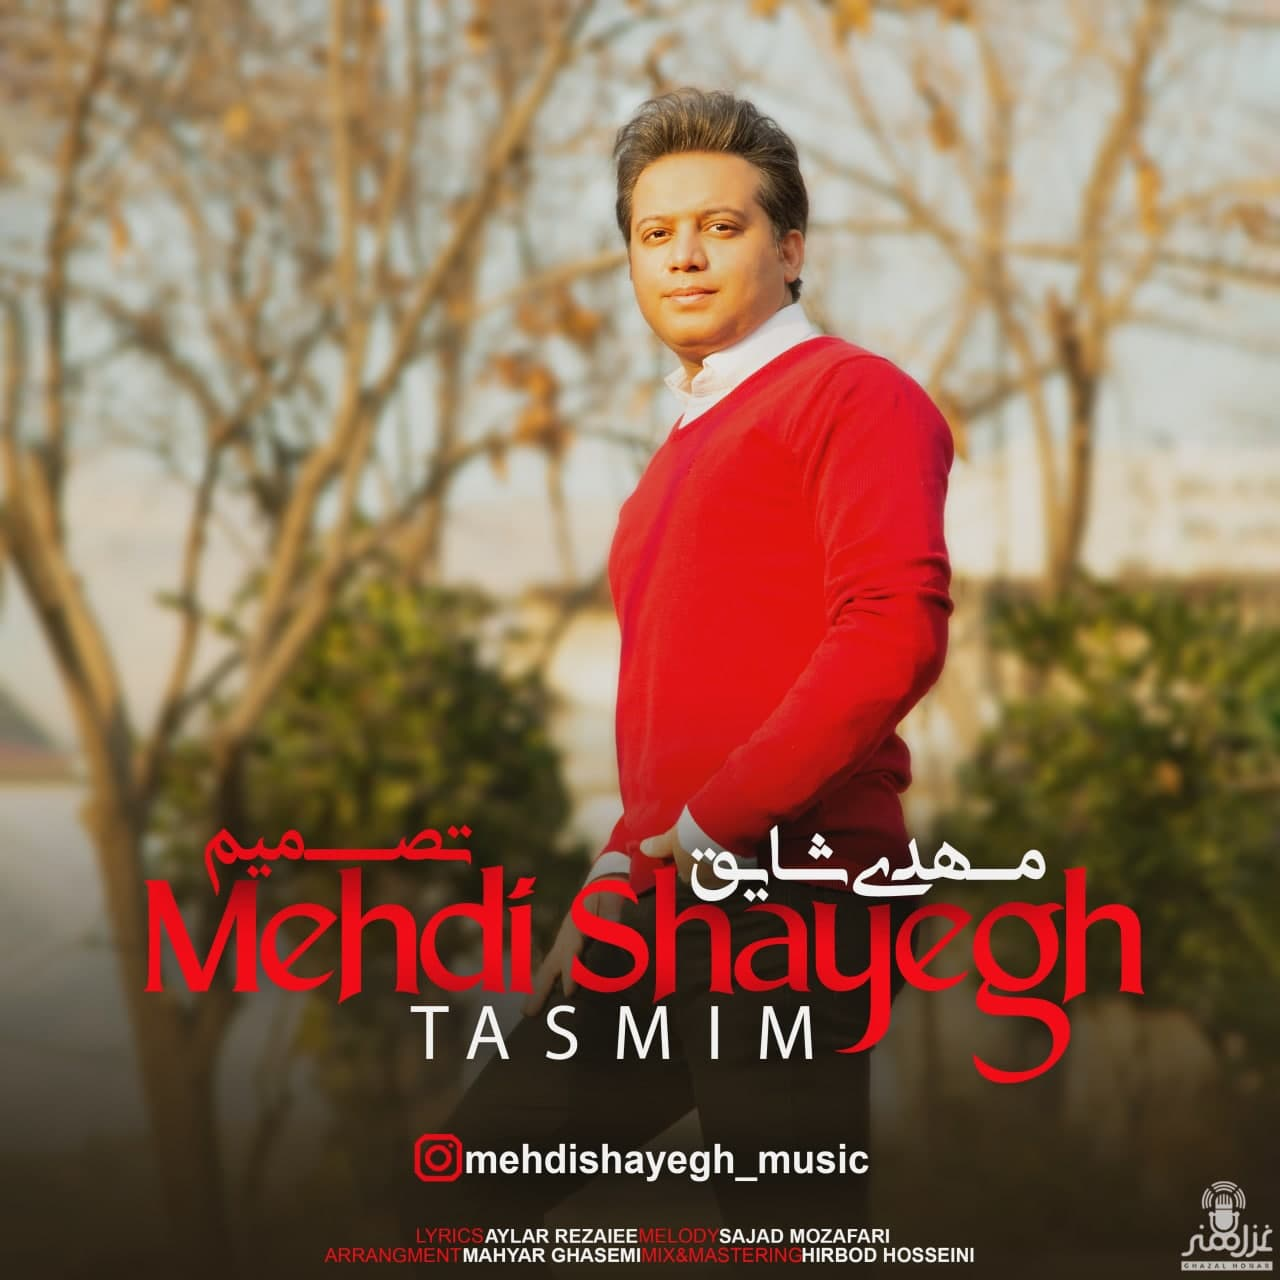 Mehdi Shayegh – Tasmim